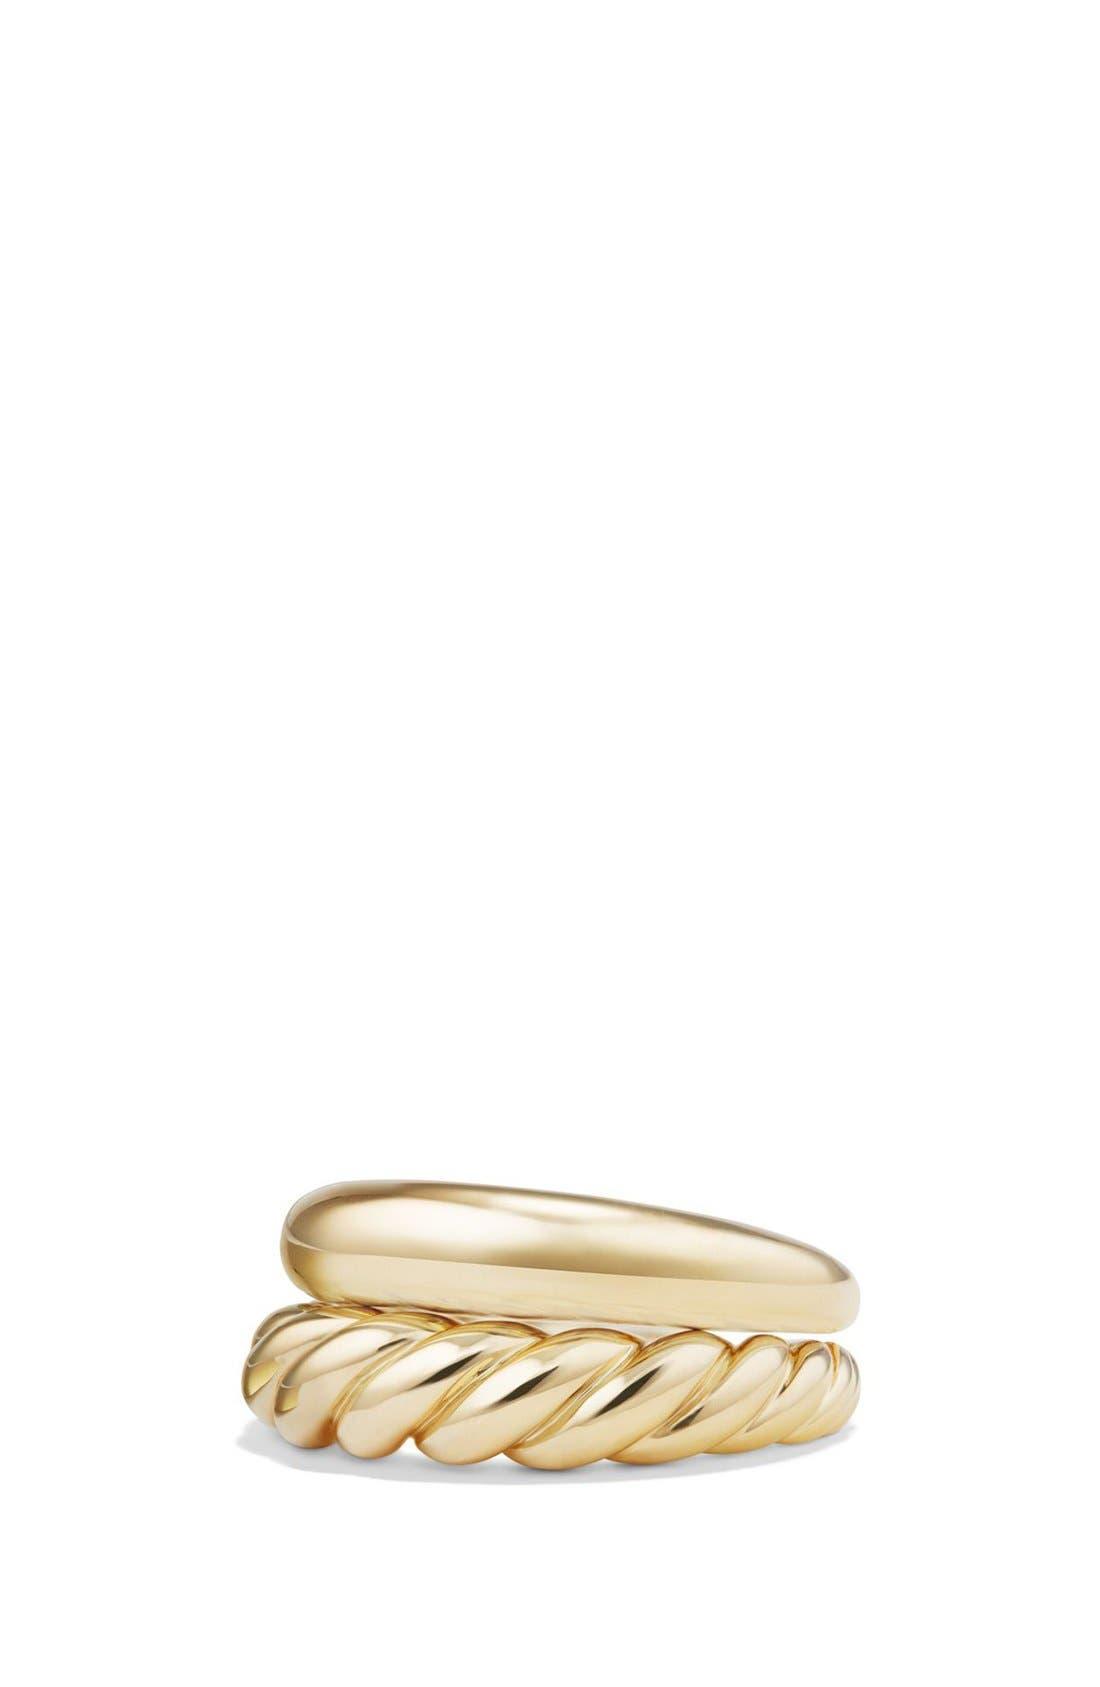 Alternate Image 1 Selected - David Yurman 'Pure Form' Stack Rings in 18K Gold